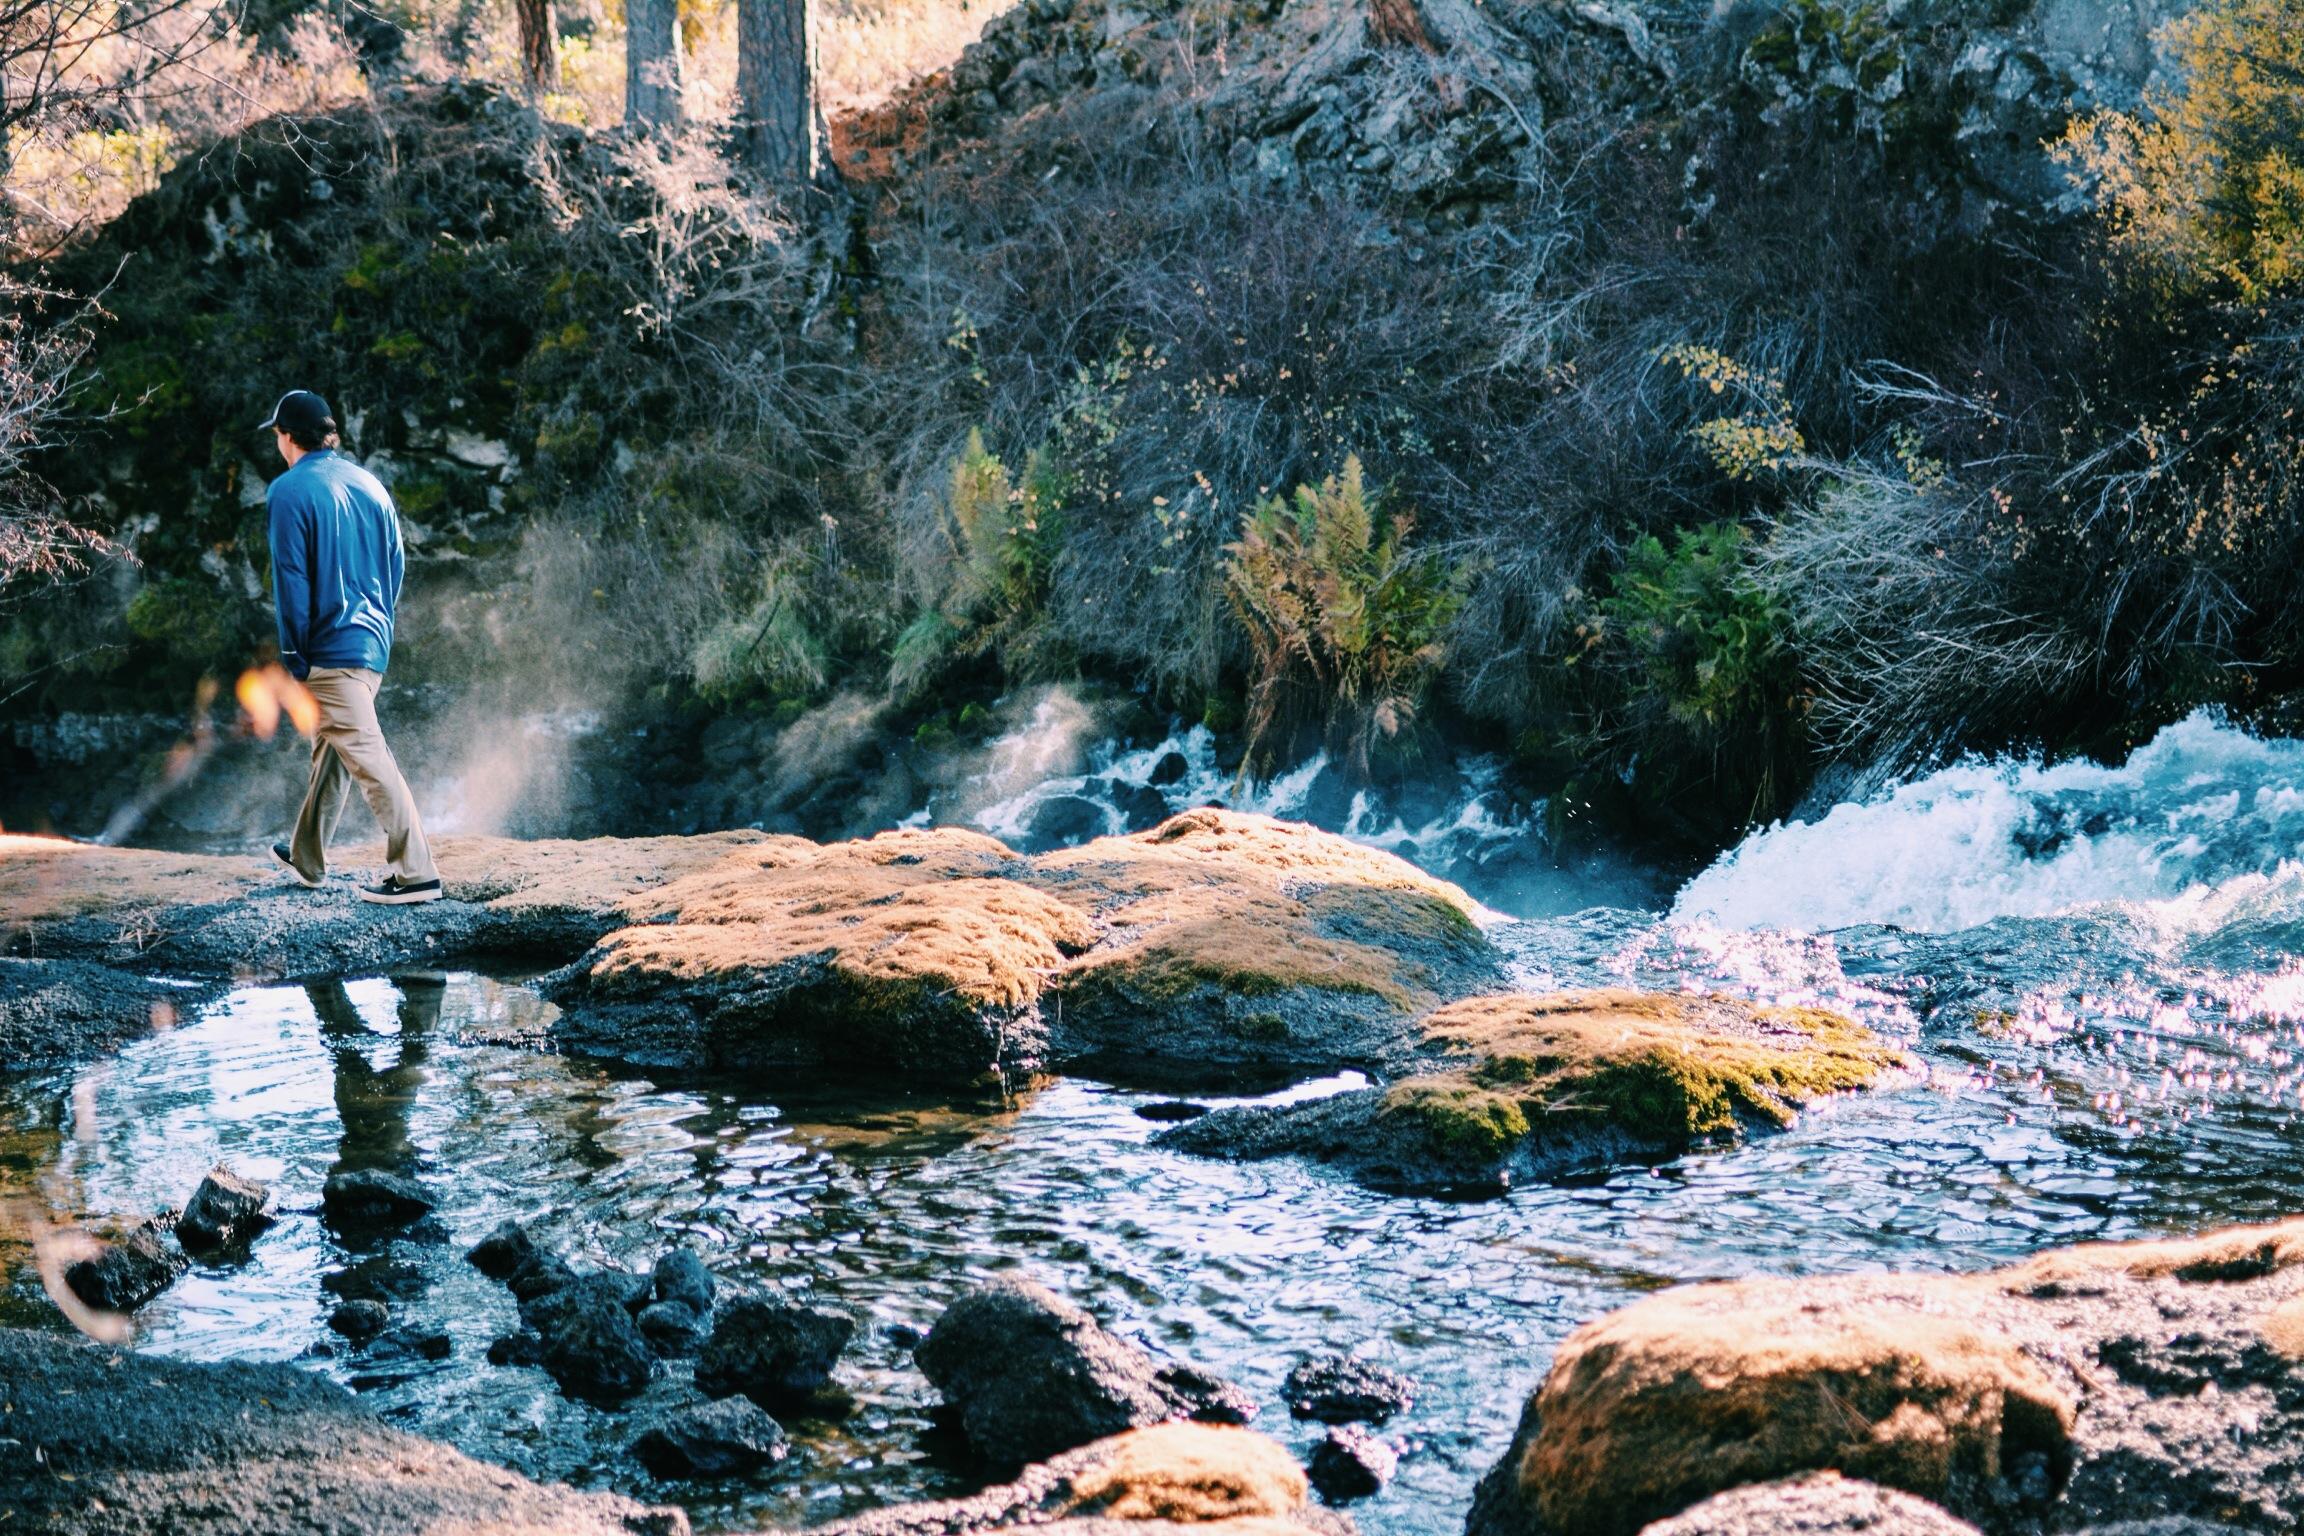 Scott in the falls of bend